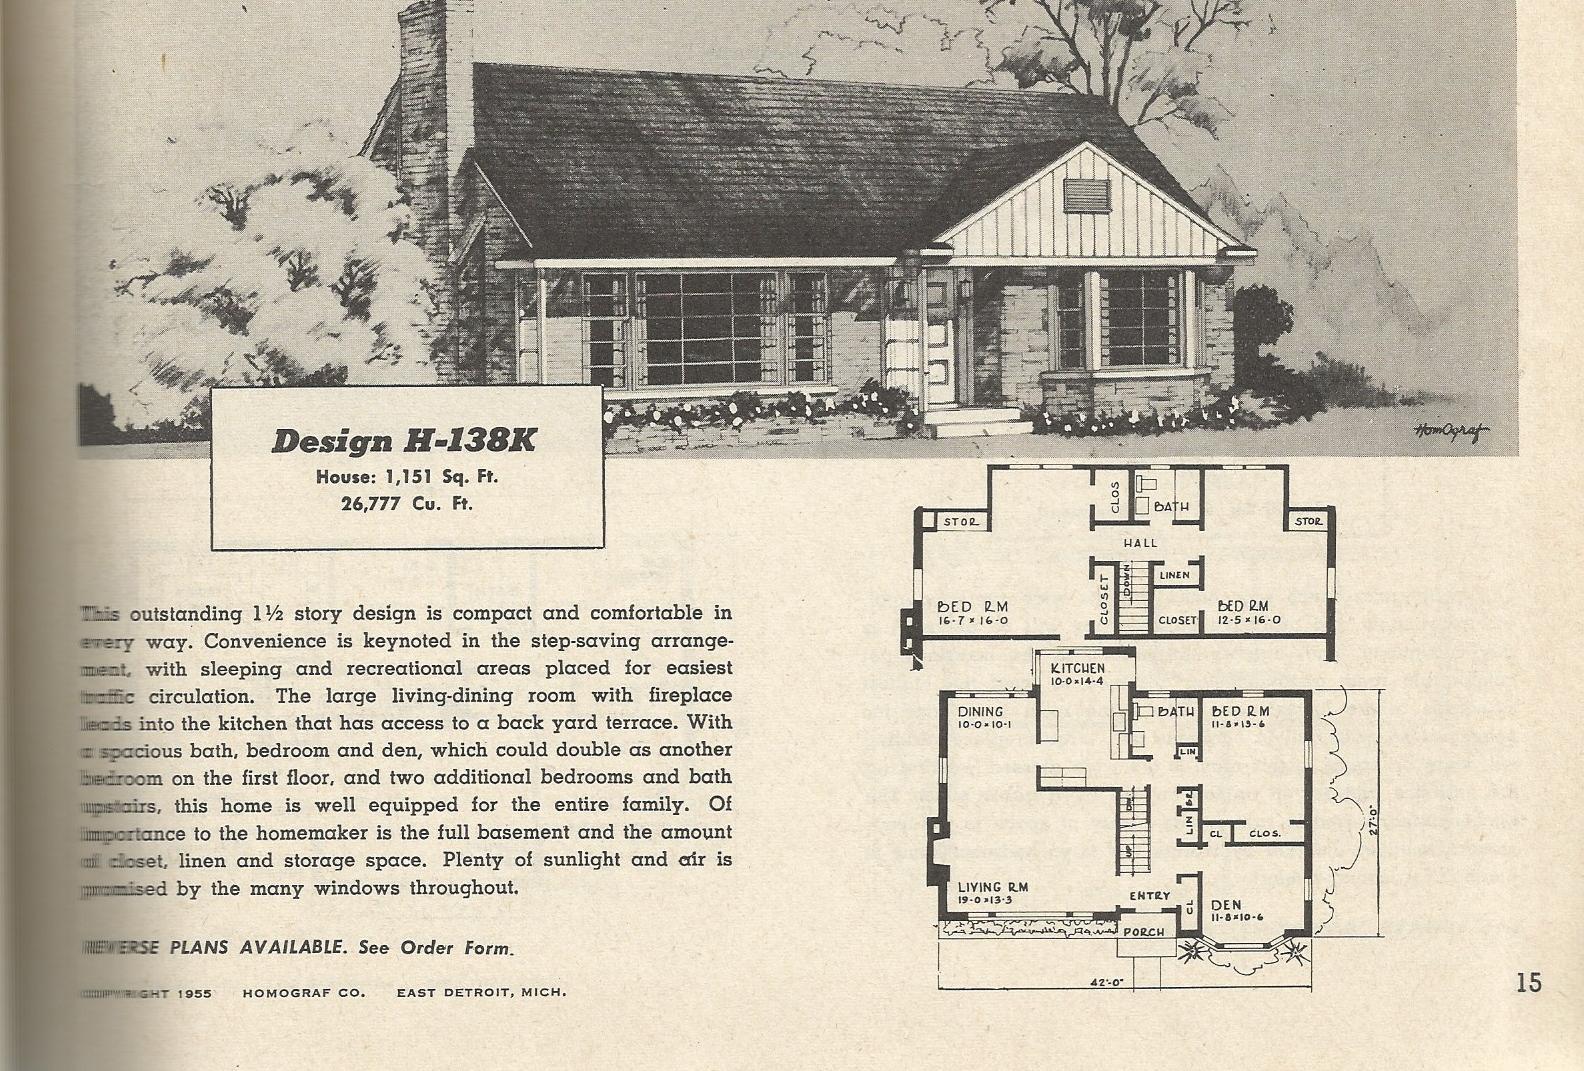 vintage house plans 138?w=300&h=202 vintage house plans 1950s budget wise ramblers antique alter ego,House Plans 1950s